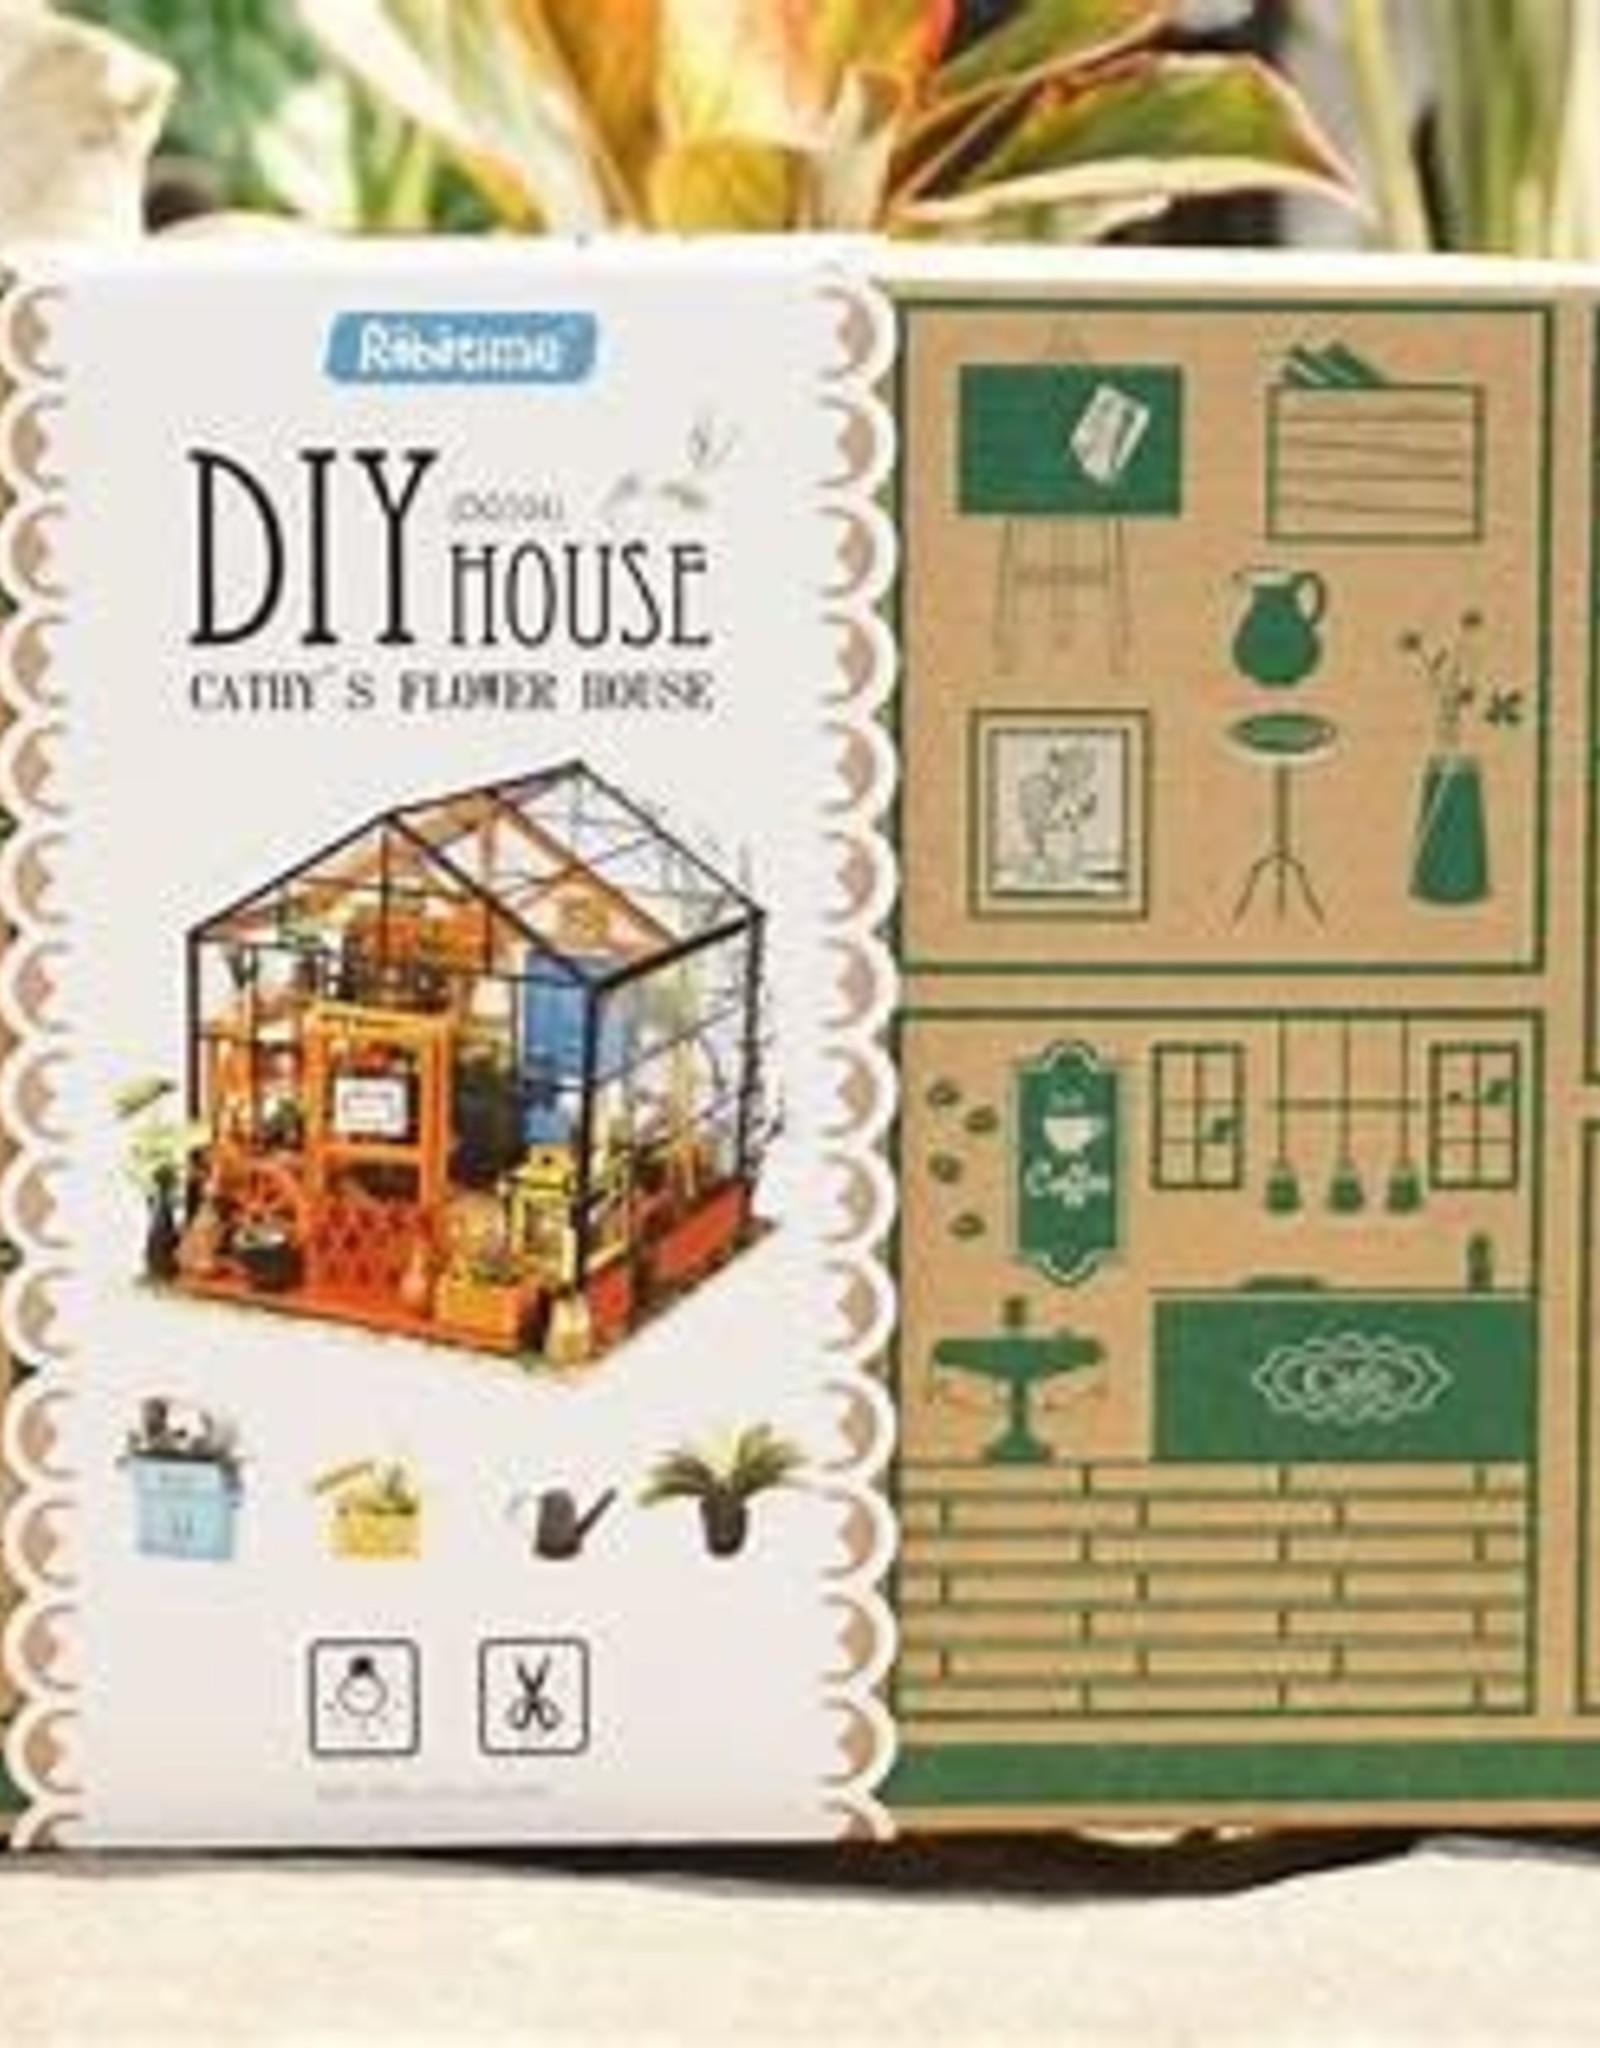 DIY Miniature Cathy's Flower House